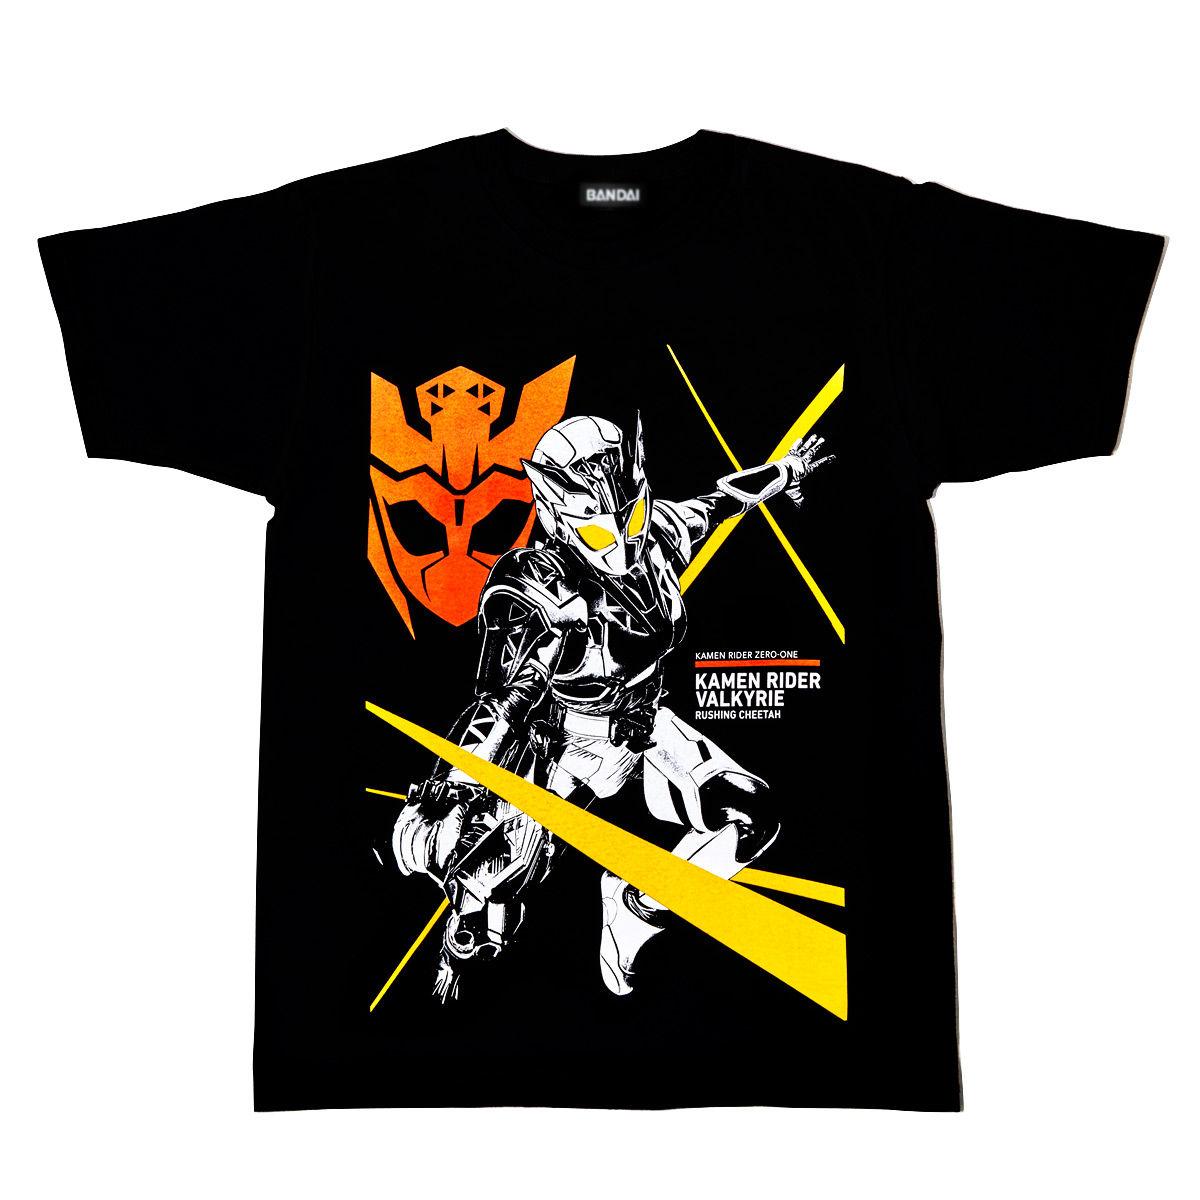 T-shirt of Dreams(Kamen Rider Valkyrie)—Kamen Rider Zero-One